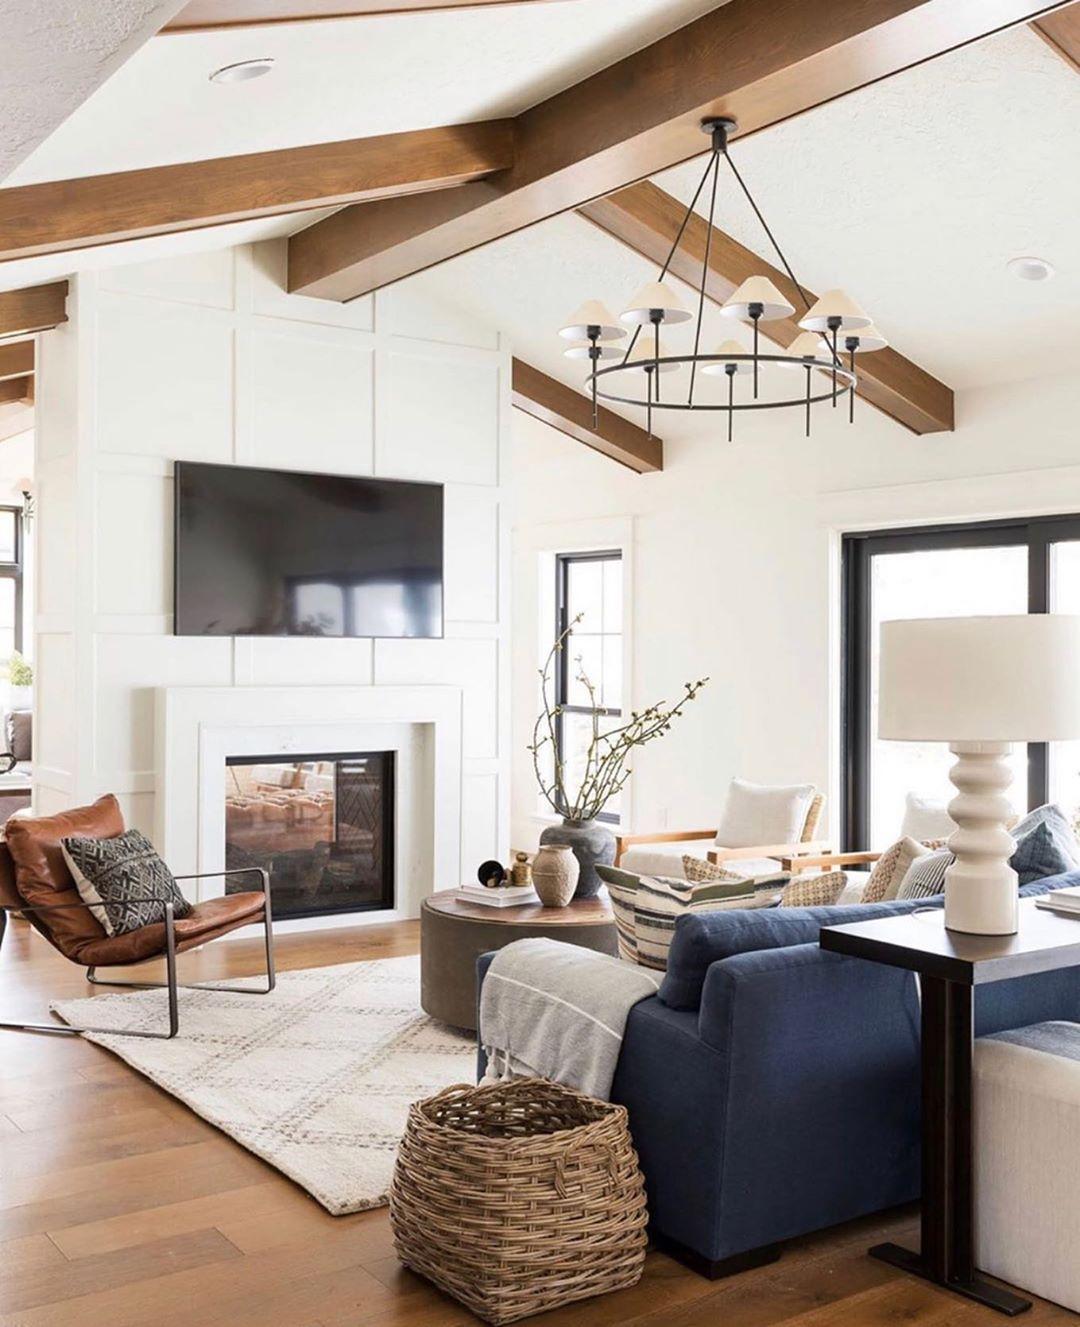 16 5k Likes 139 Comments Studio Mcgee Studiomcgee On Instagram Love When Spaces Speak Beams Living Room High Ceiling Living Room Wood Beams Living Room [ 1327 x 1080 Pixel ]